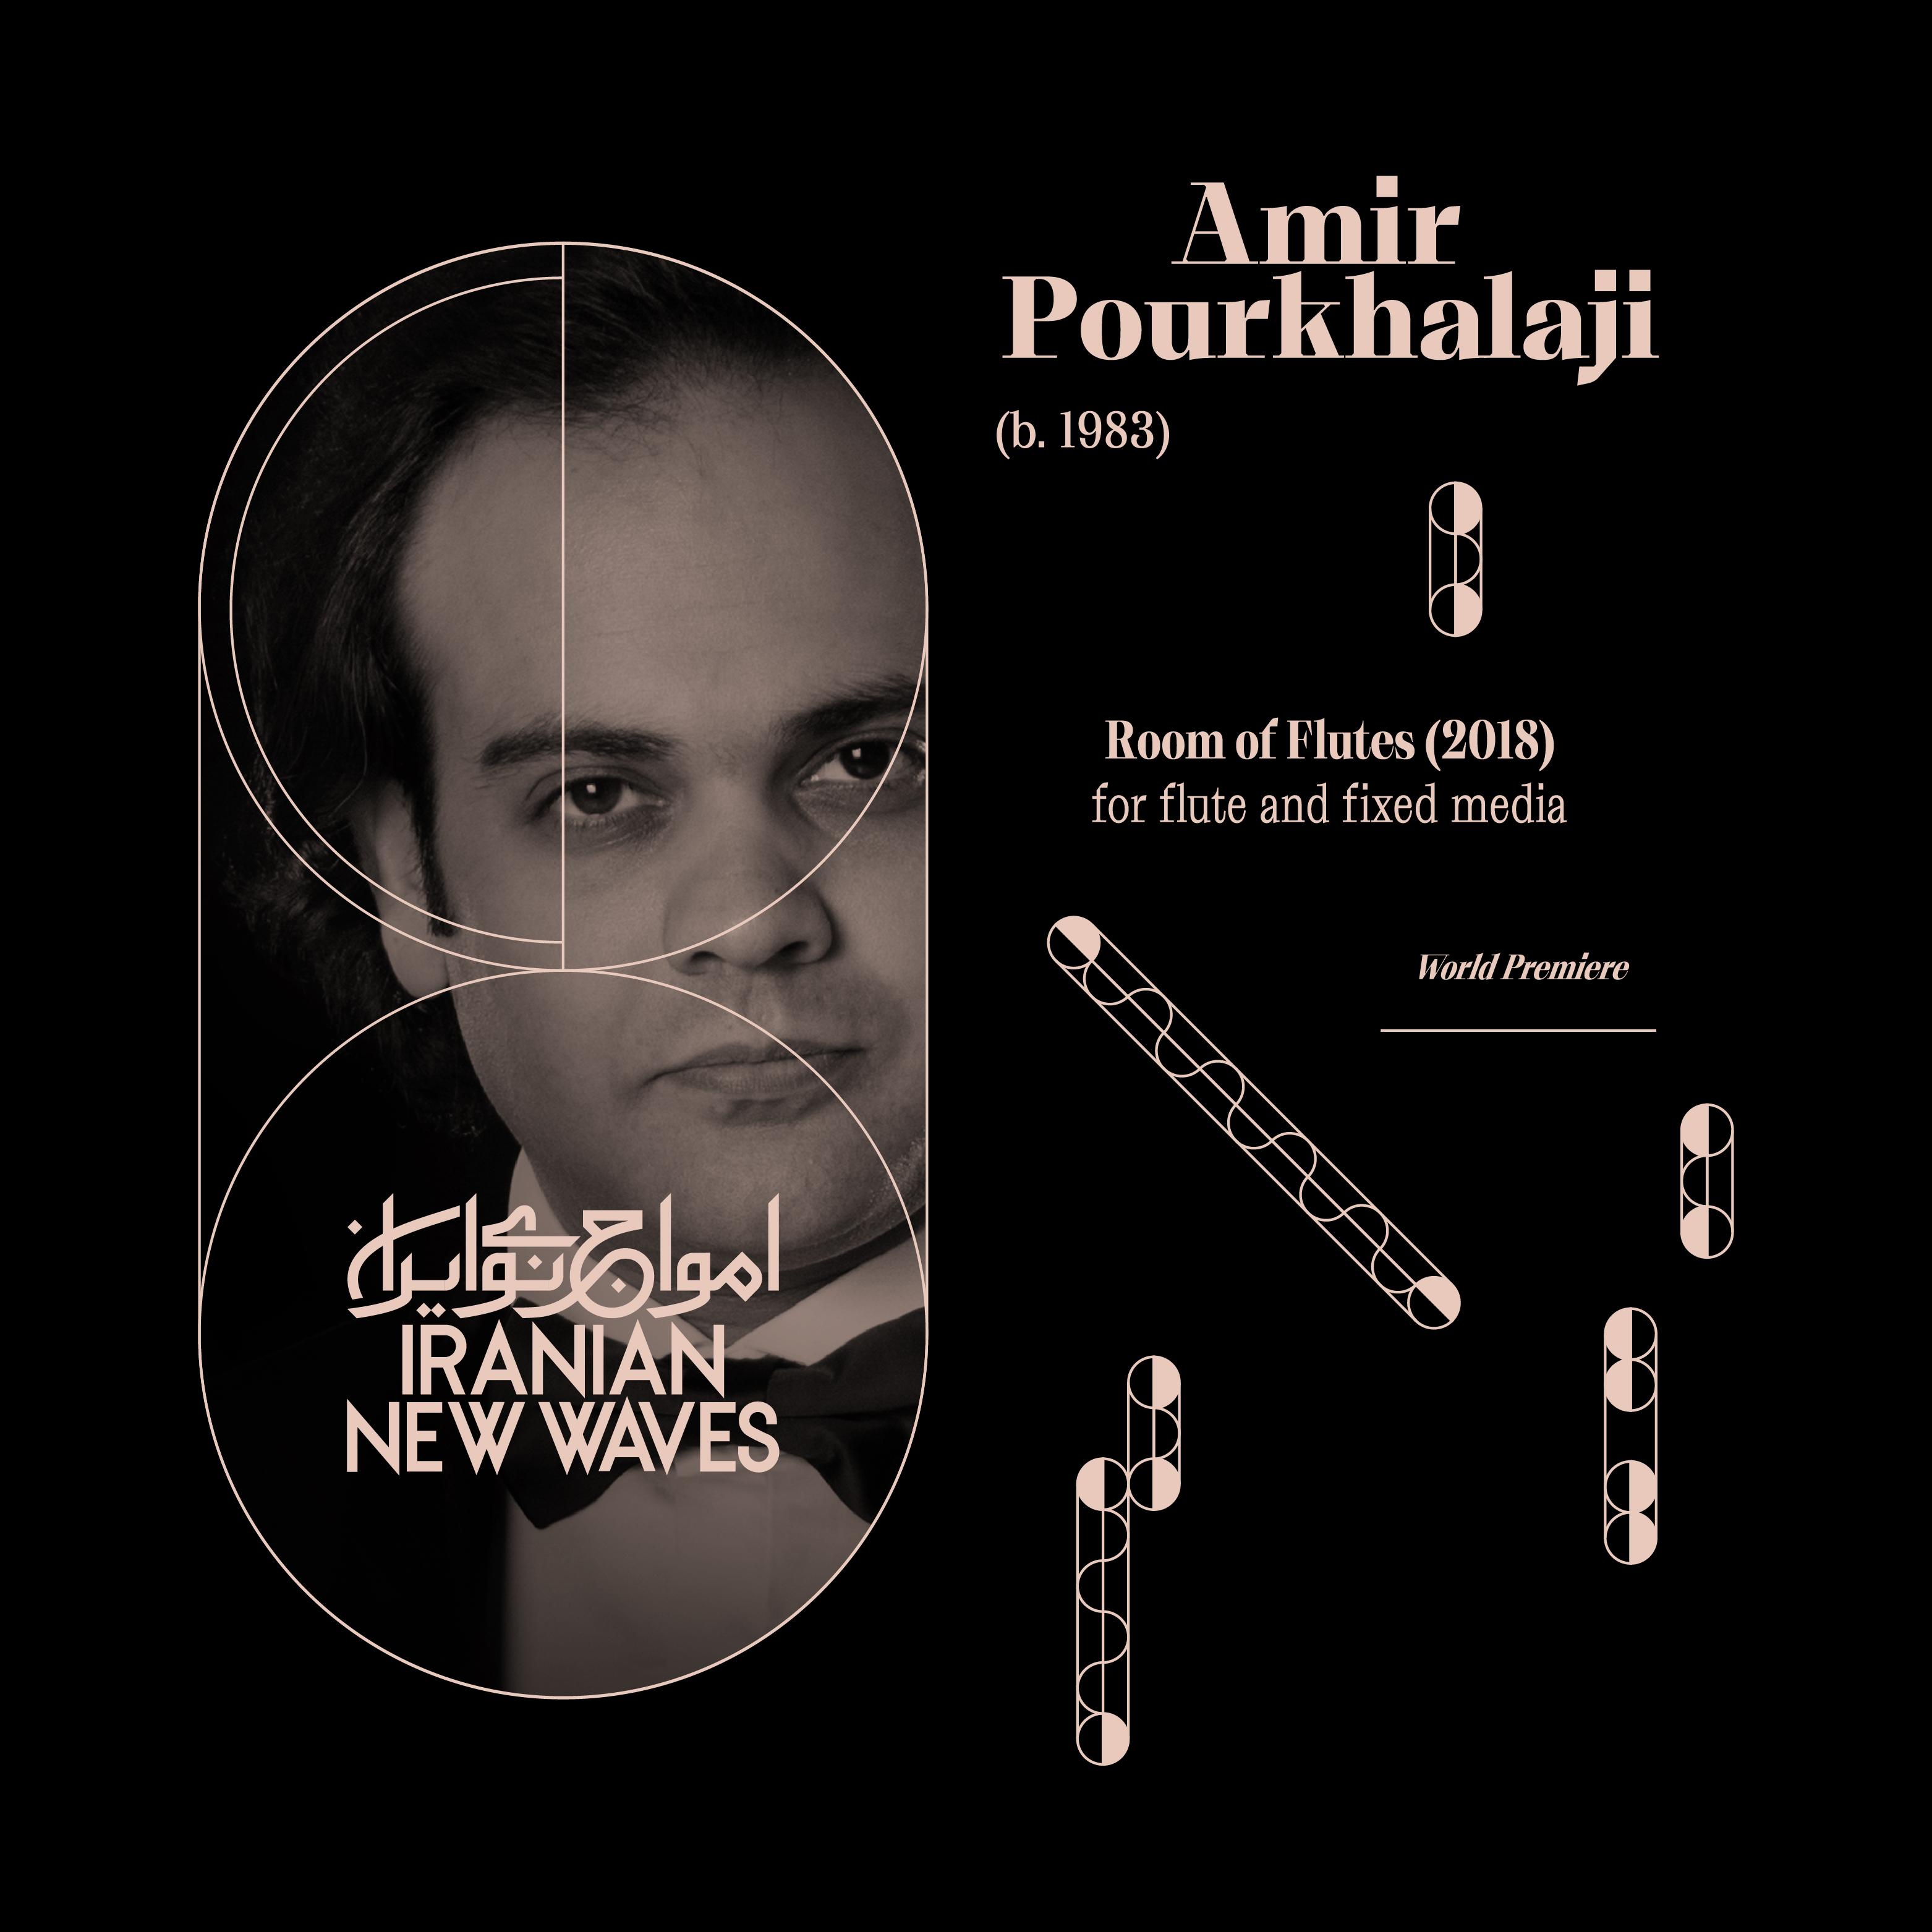 Iranian New Waves Amir Pourkhalaji امیر پورخلجی امواج نوی ایران اتاق فلوت ها Room of Flutes